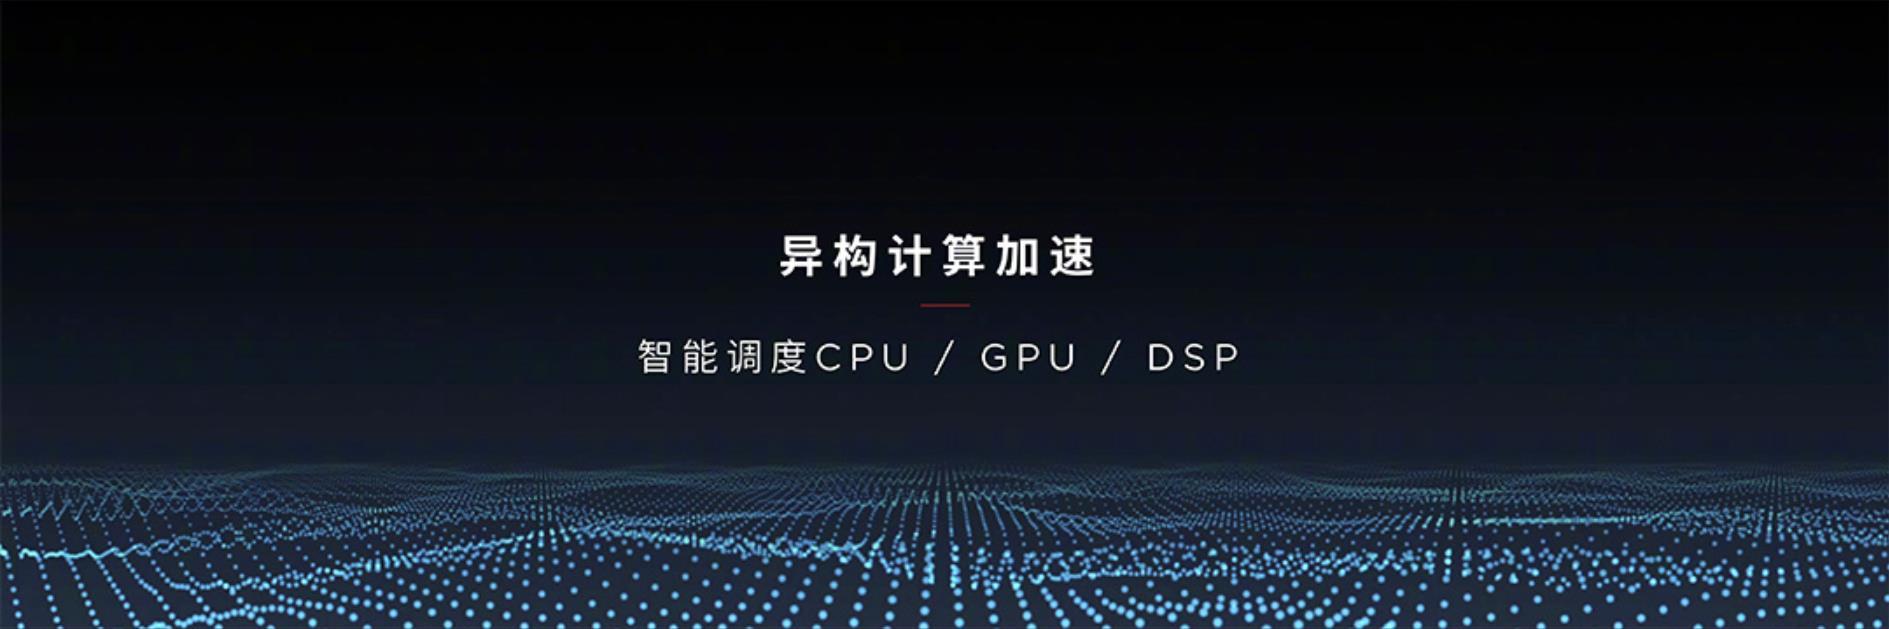 WeChat截圖_20180926135838.jpg